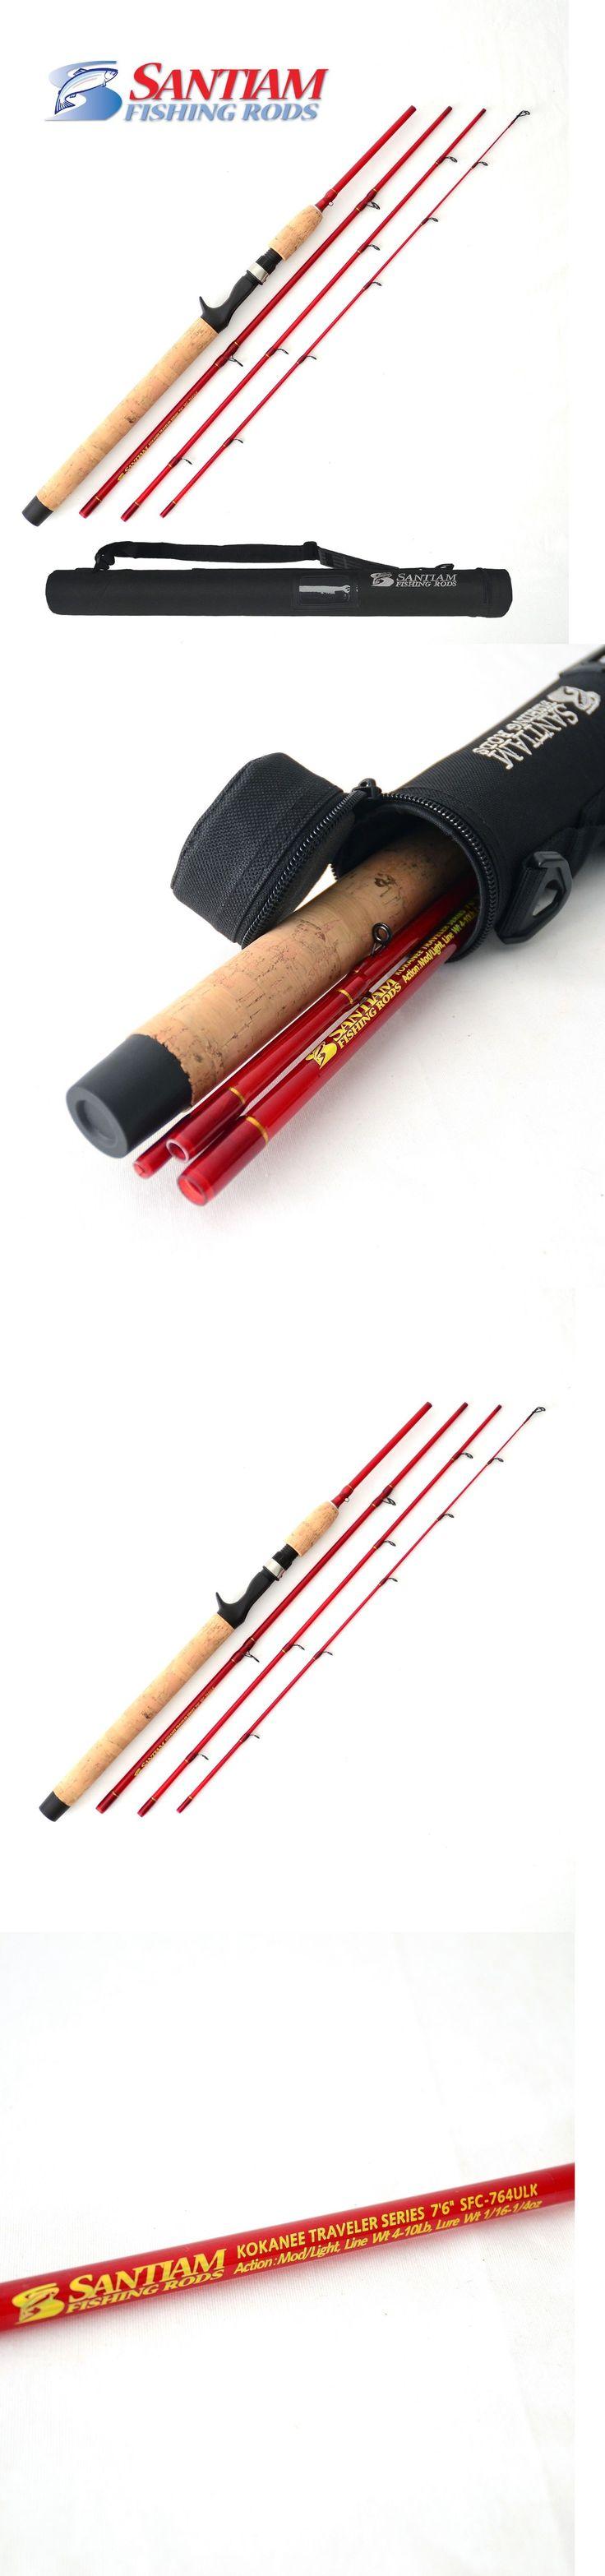 Travel Rods 179949: Santiam Fishing Rods 4 Pc 7 6 4-10Lb Ul Glass Kokanee Rod Usa Seller -> BUY IT NOW ONLY: $99.95 on eBay!